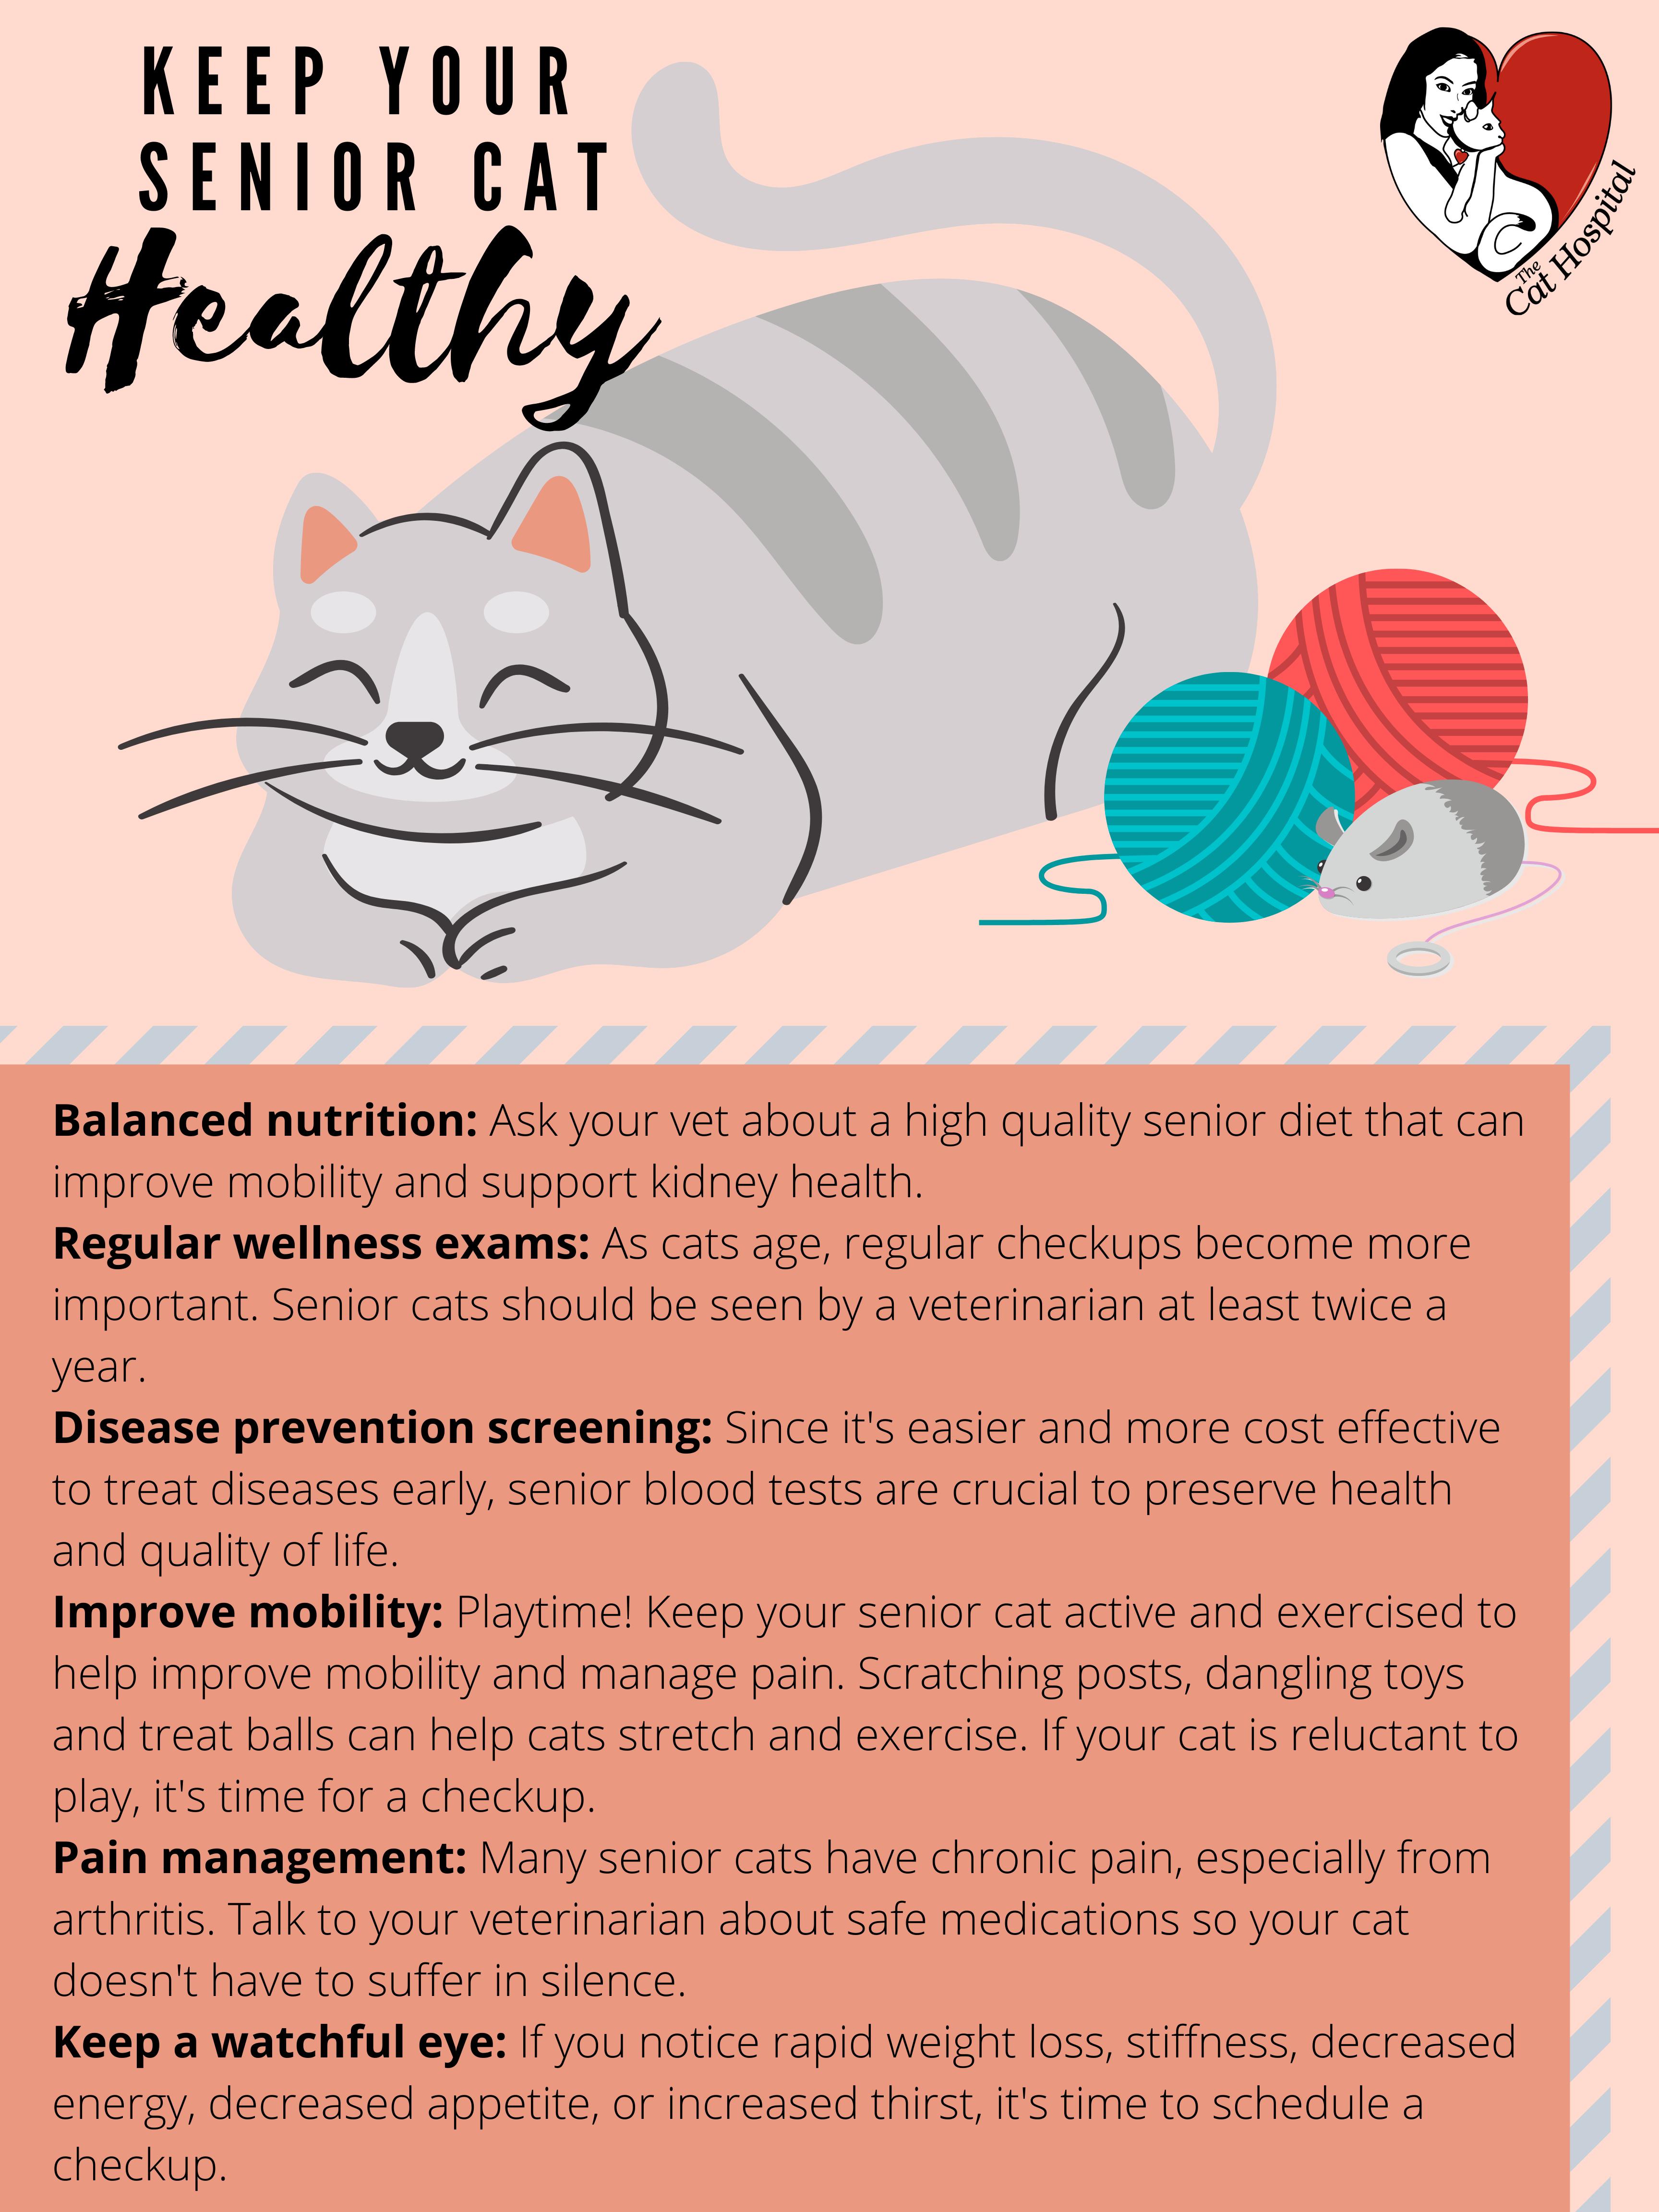 Keep Senior Cat Healthy